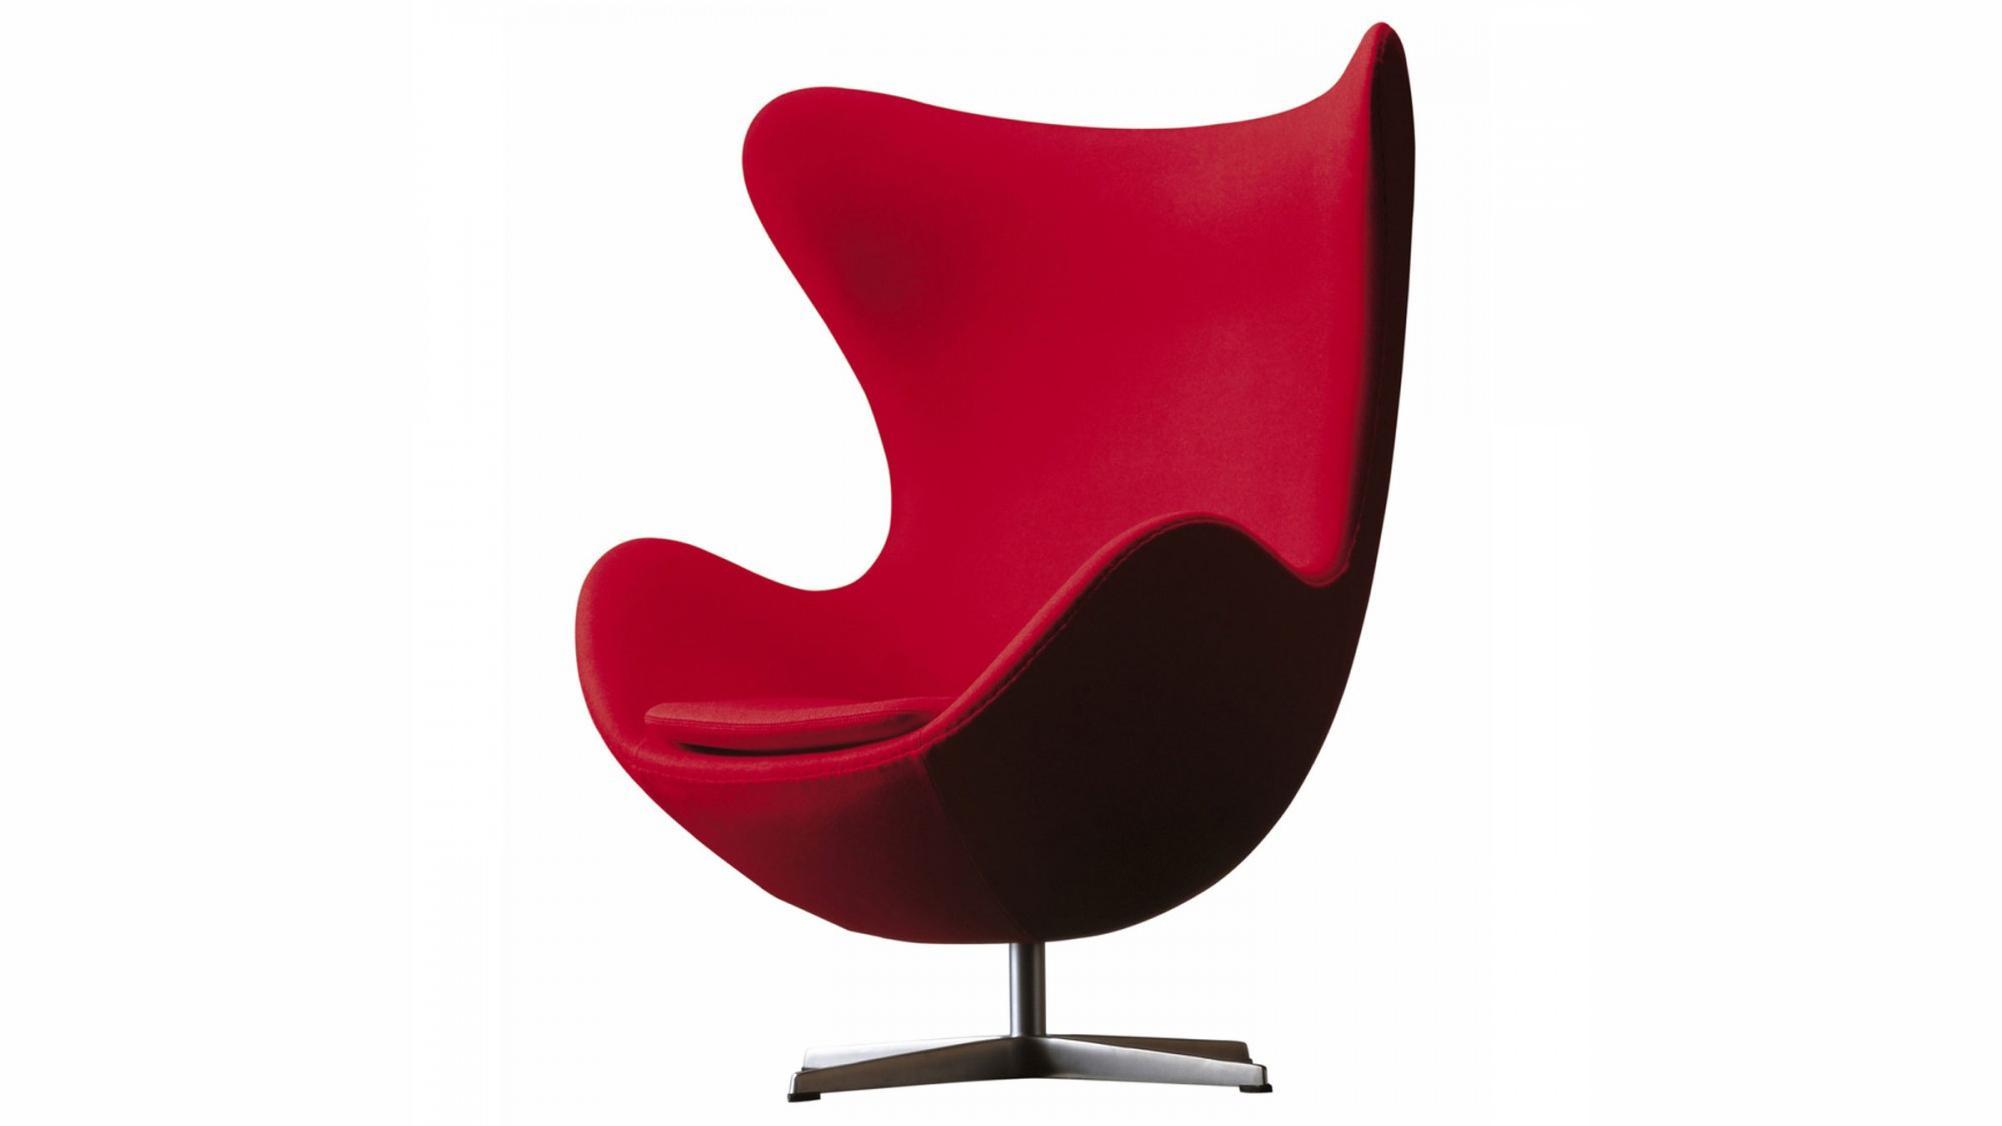 Mid-century modern design: Egg chair